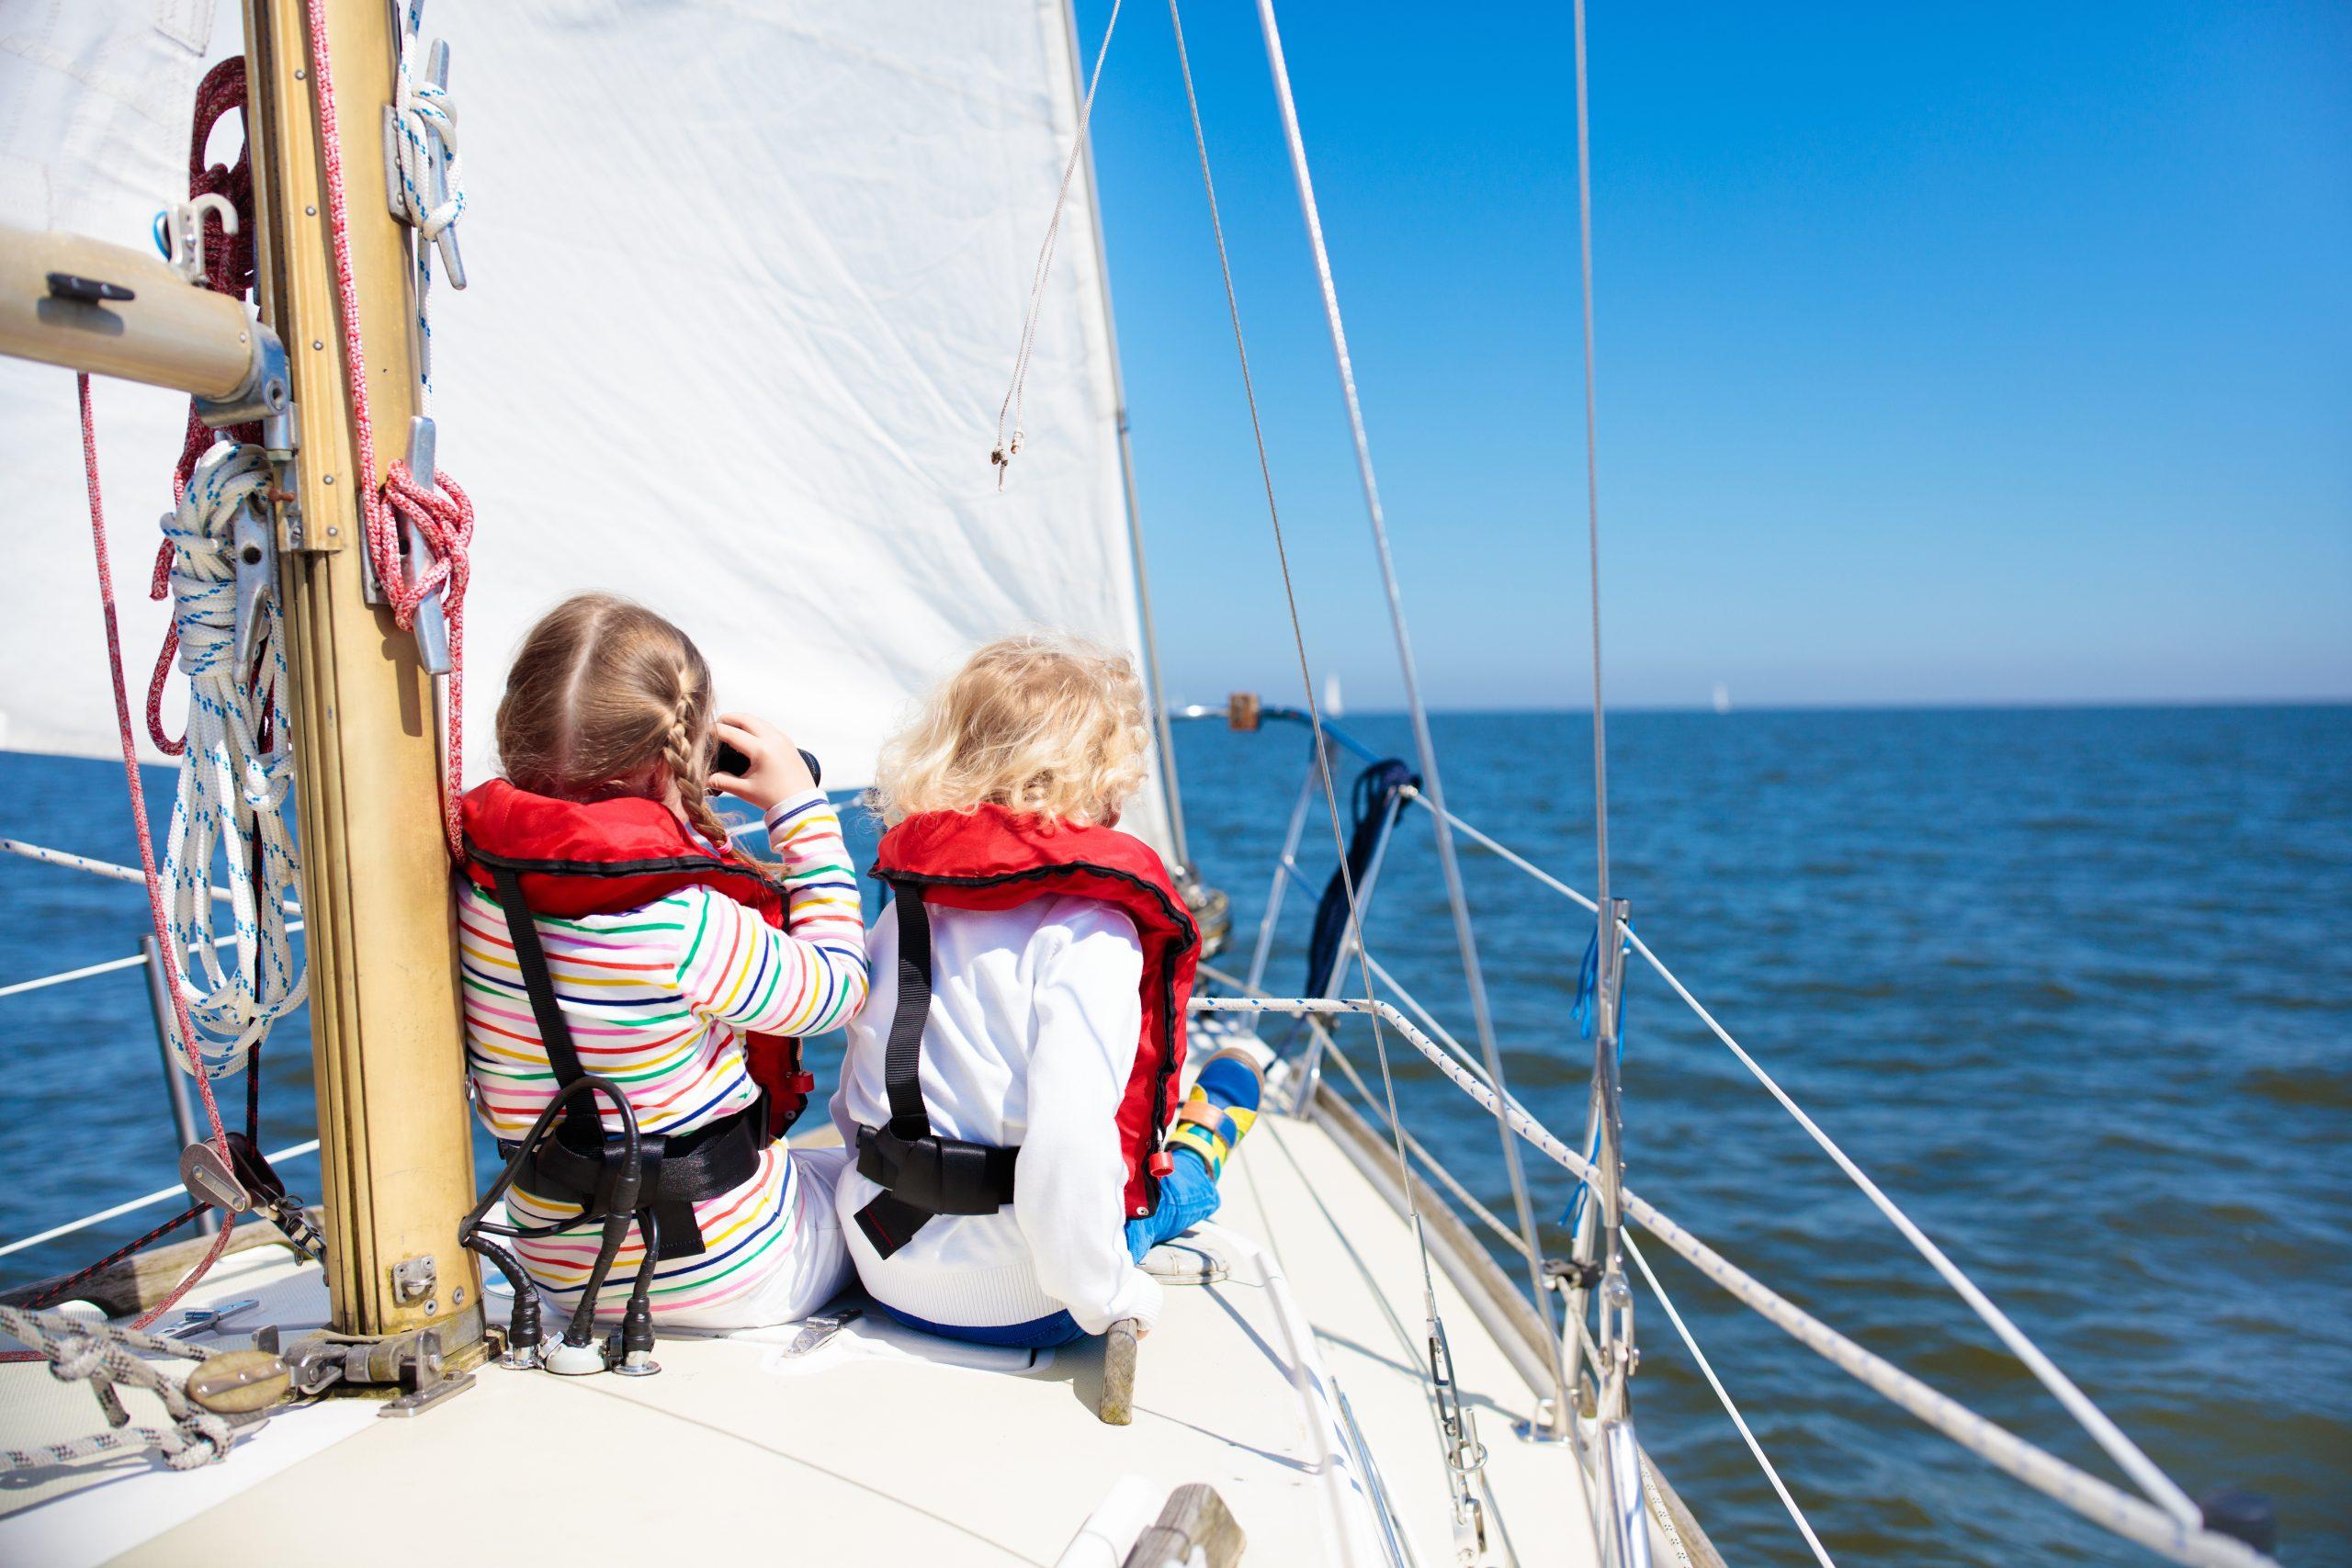 Crucero familiar en la costa blanca Velero en familia por Formentera Semana en familia por la costa blanca crucero por costa blanca en familia